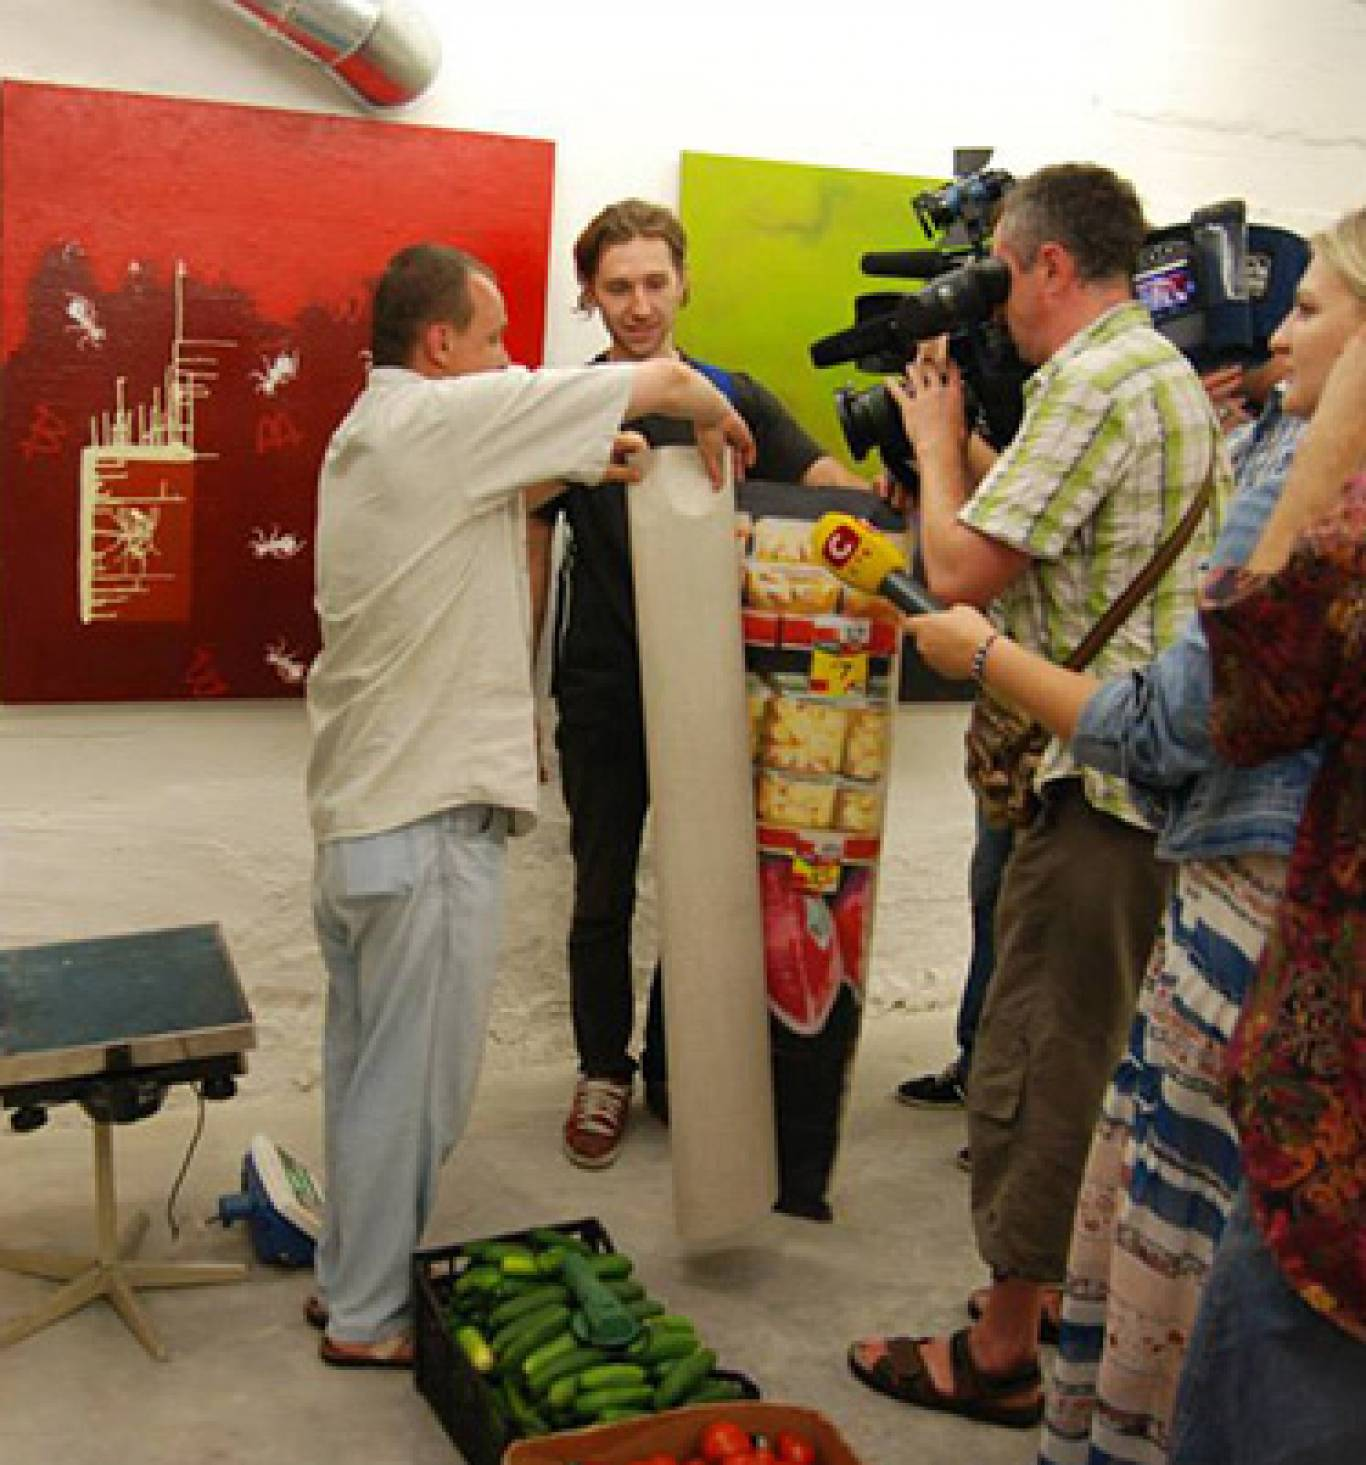 Second hand сучасного мистецтва в 8bit Gallery